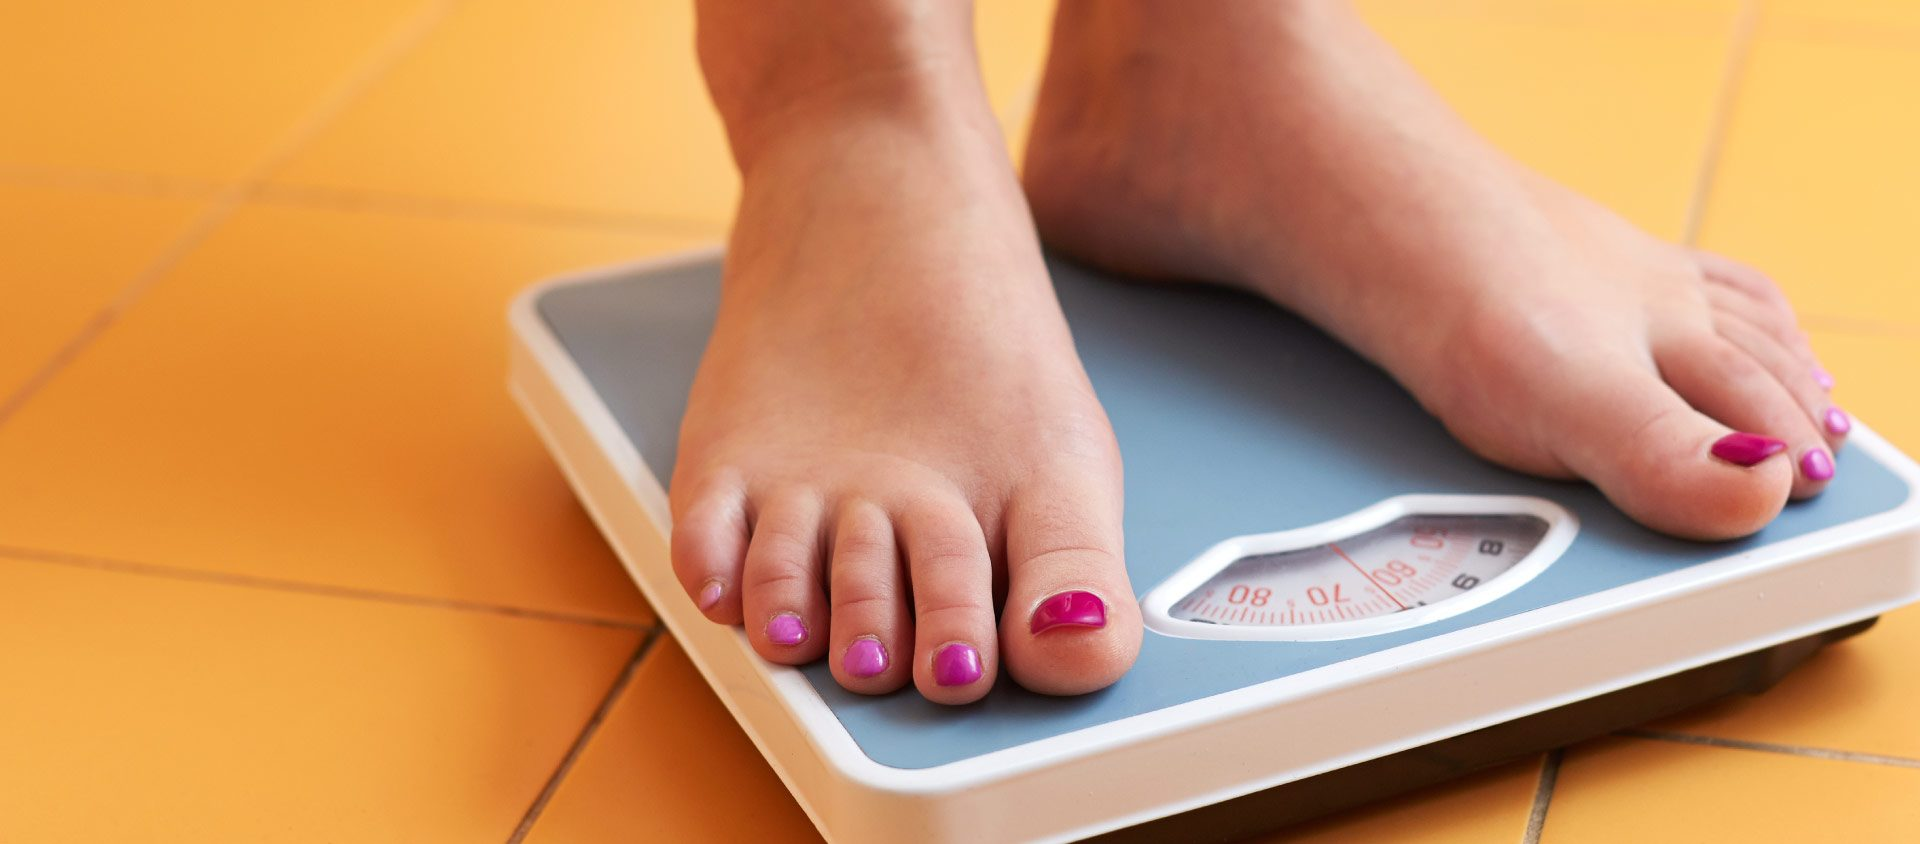 Controle da obesidade é prioridade para a saúde